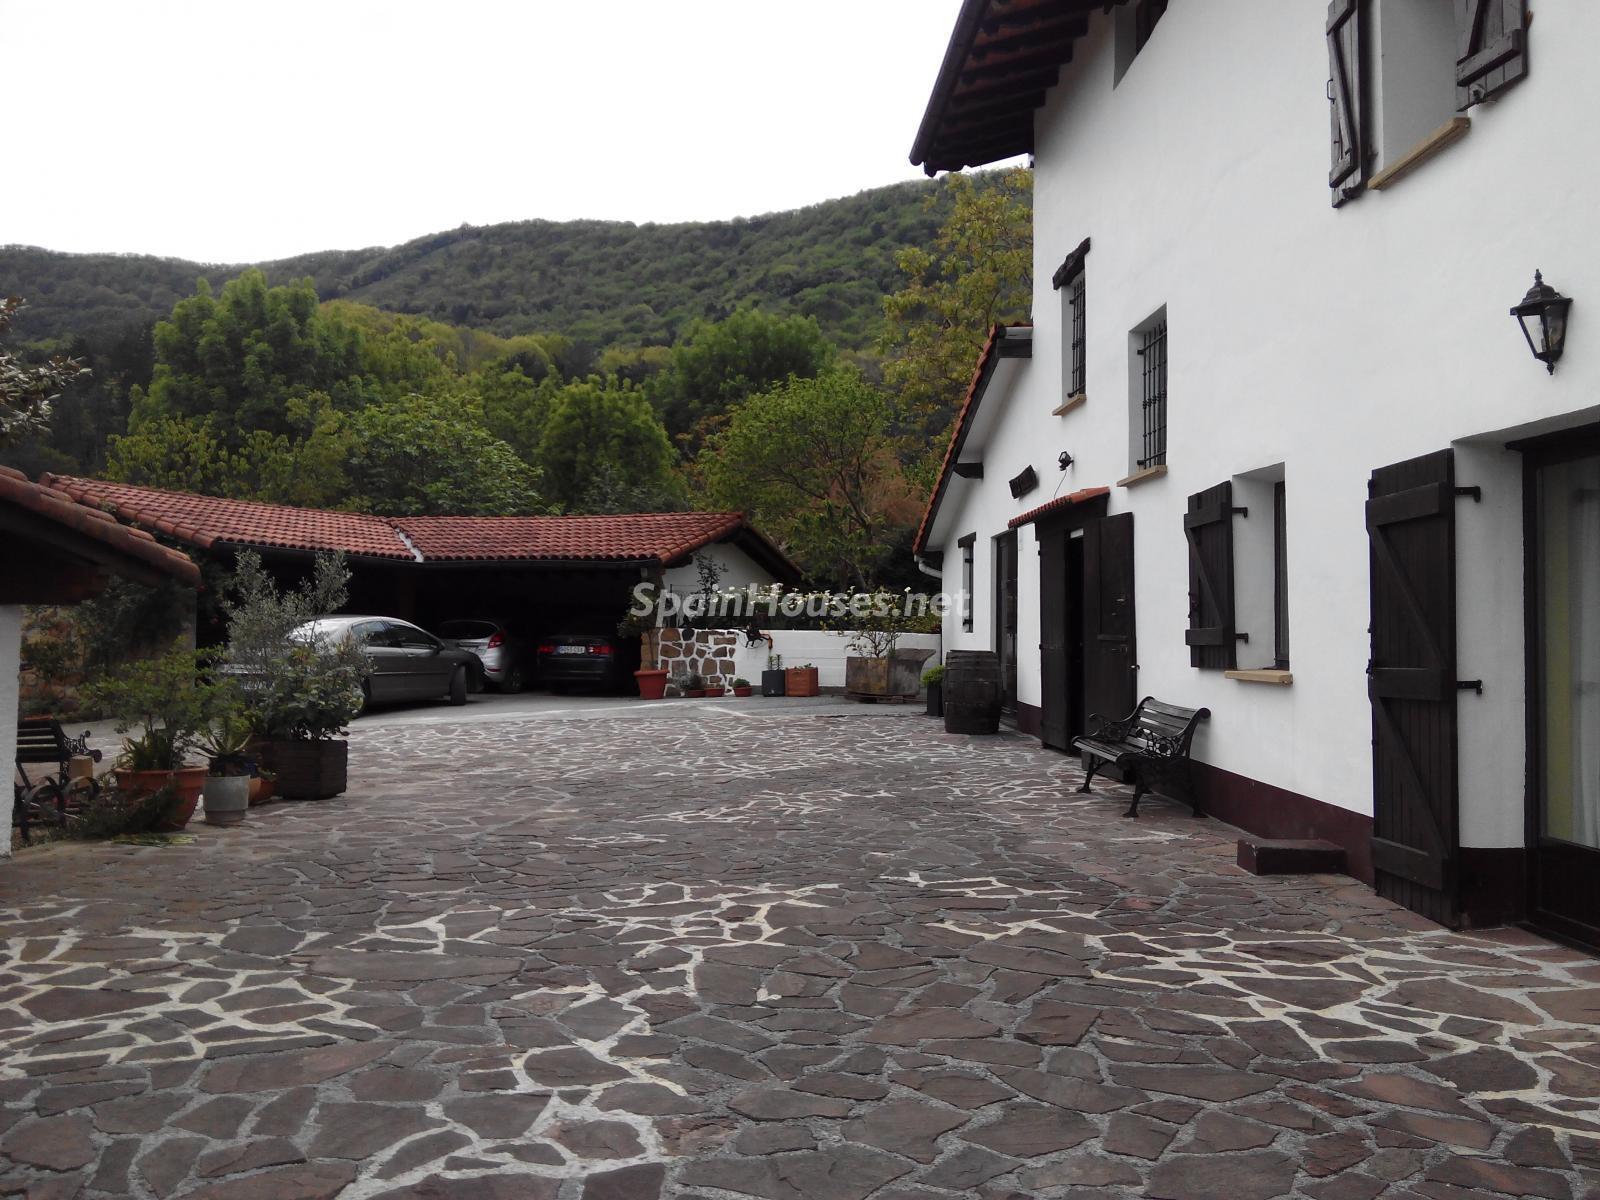 5. House for sale in Hondarribia Guipúzcoa - Charming Country House in Hondarribia, Guipúzcoa